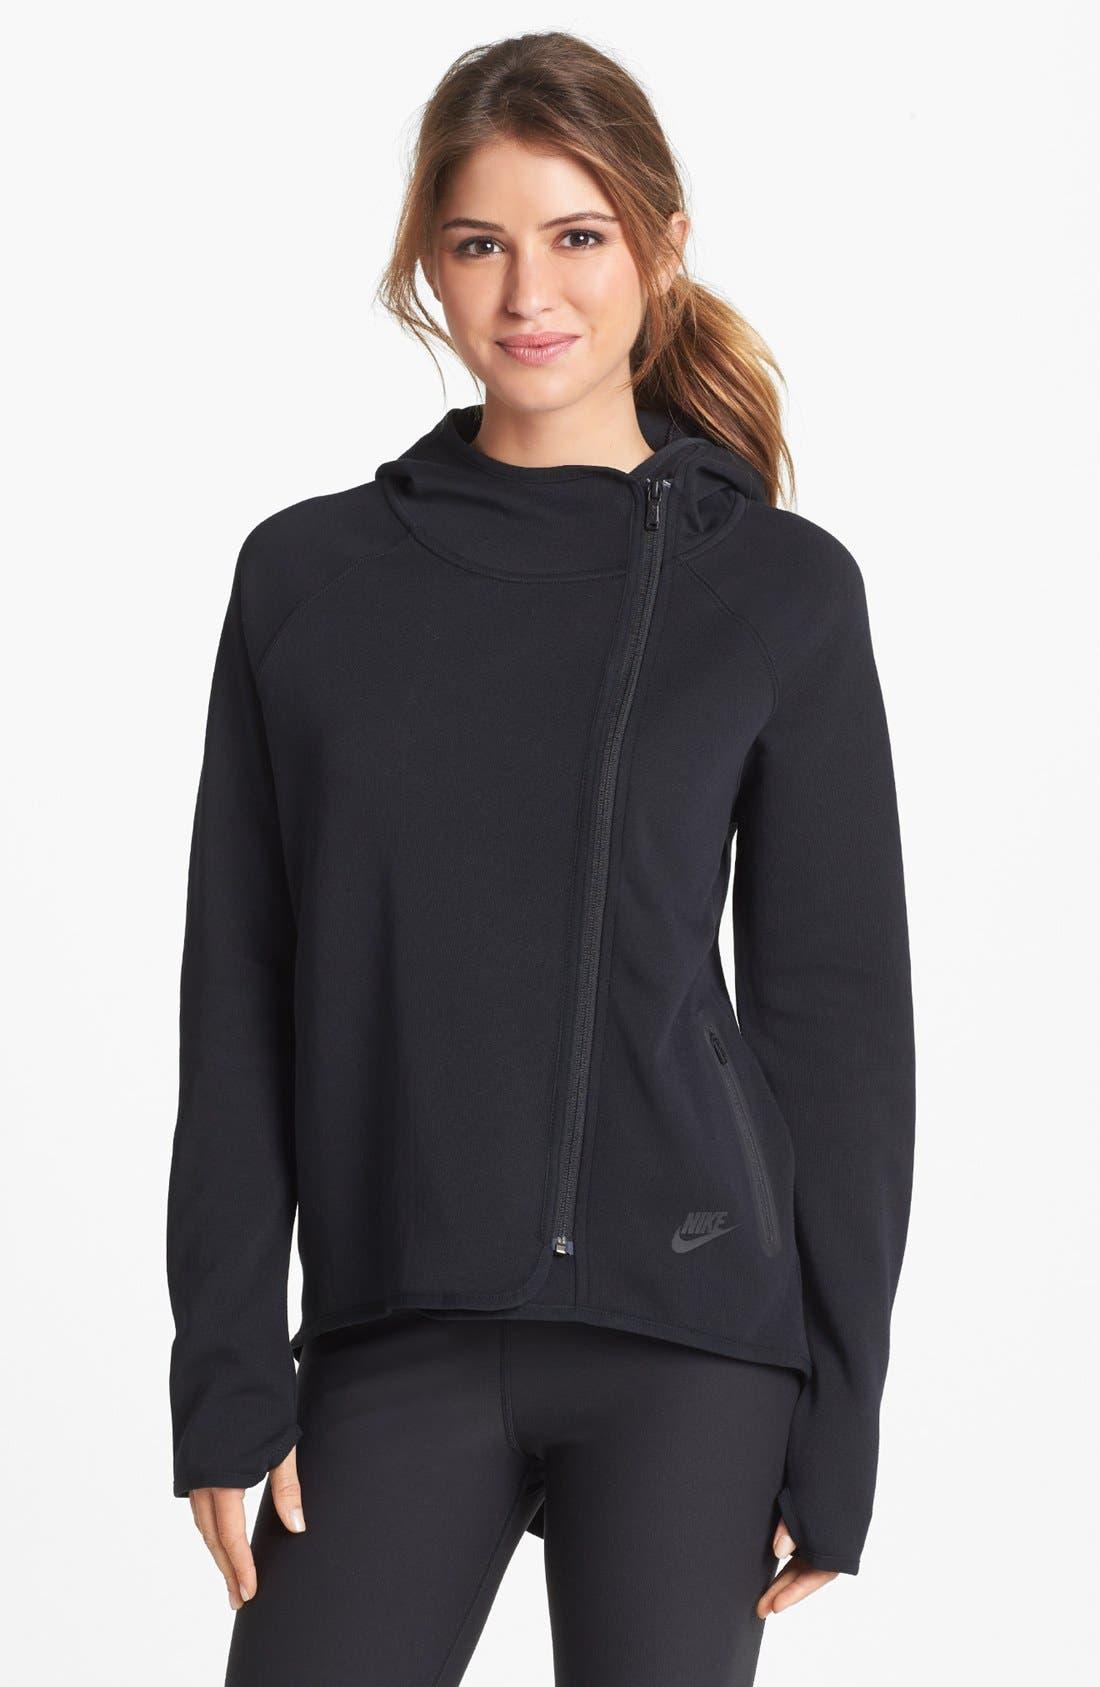 Alternate Image 1 Selected - Nike 'Tech' Cape Jacket